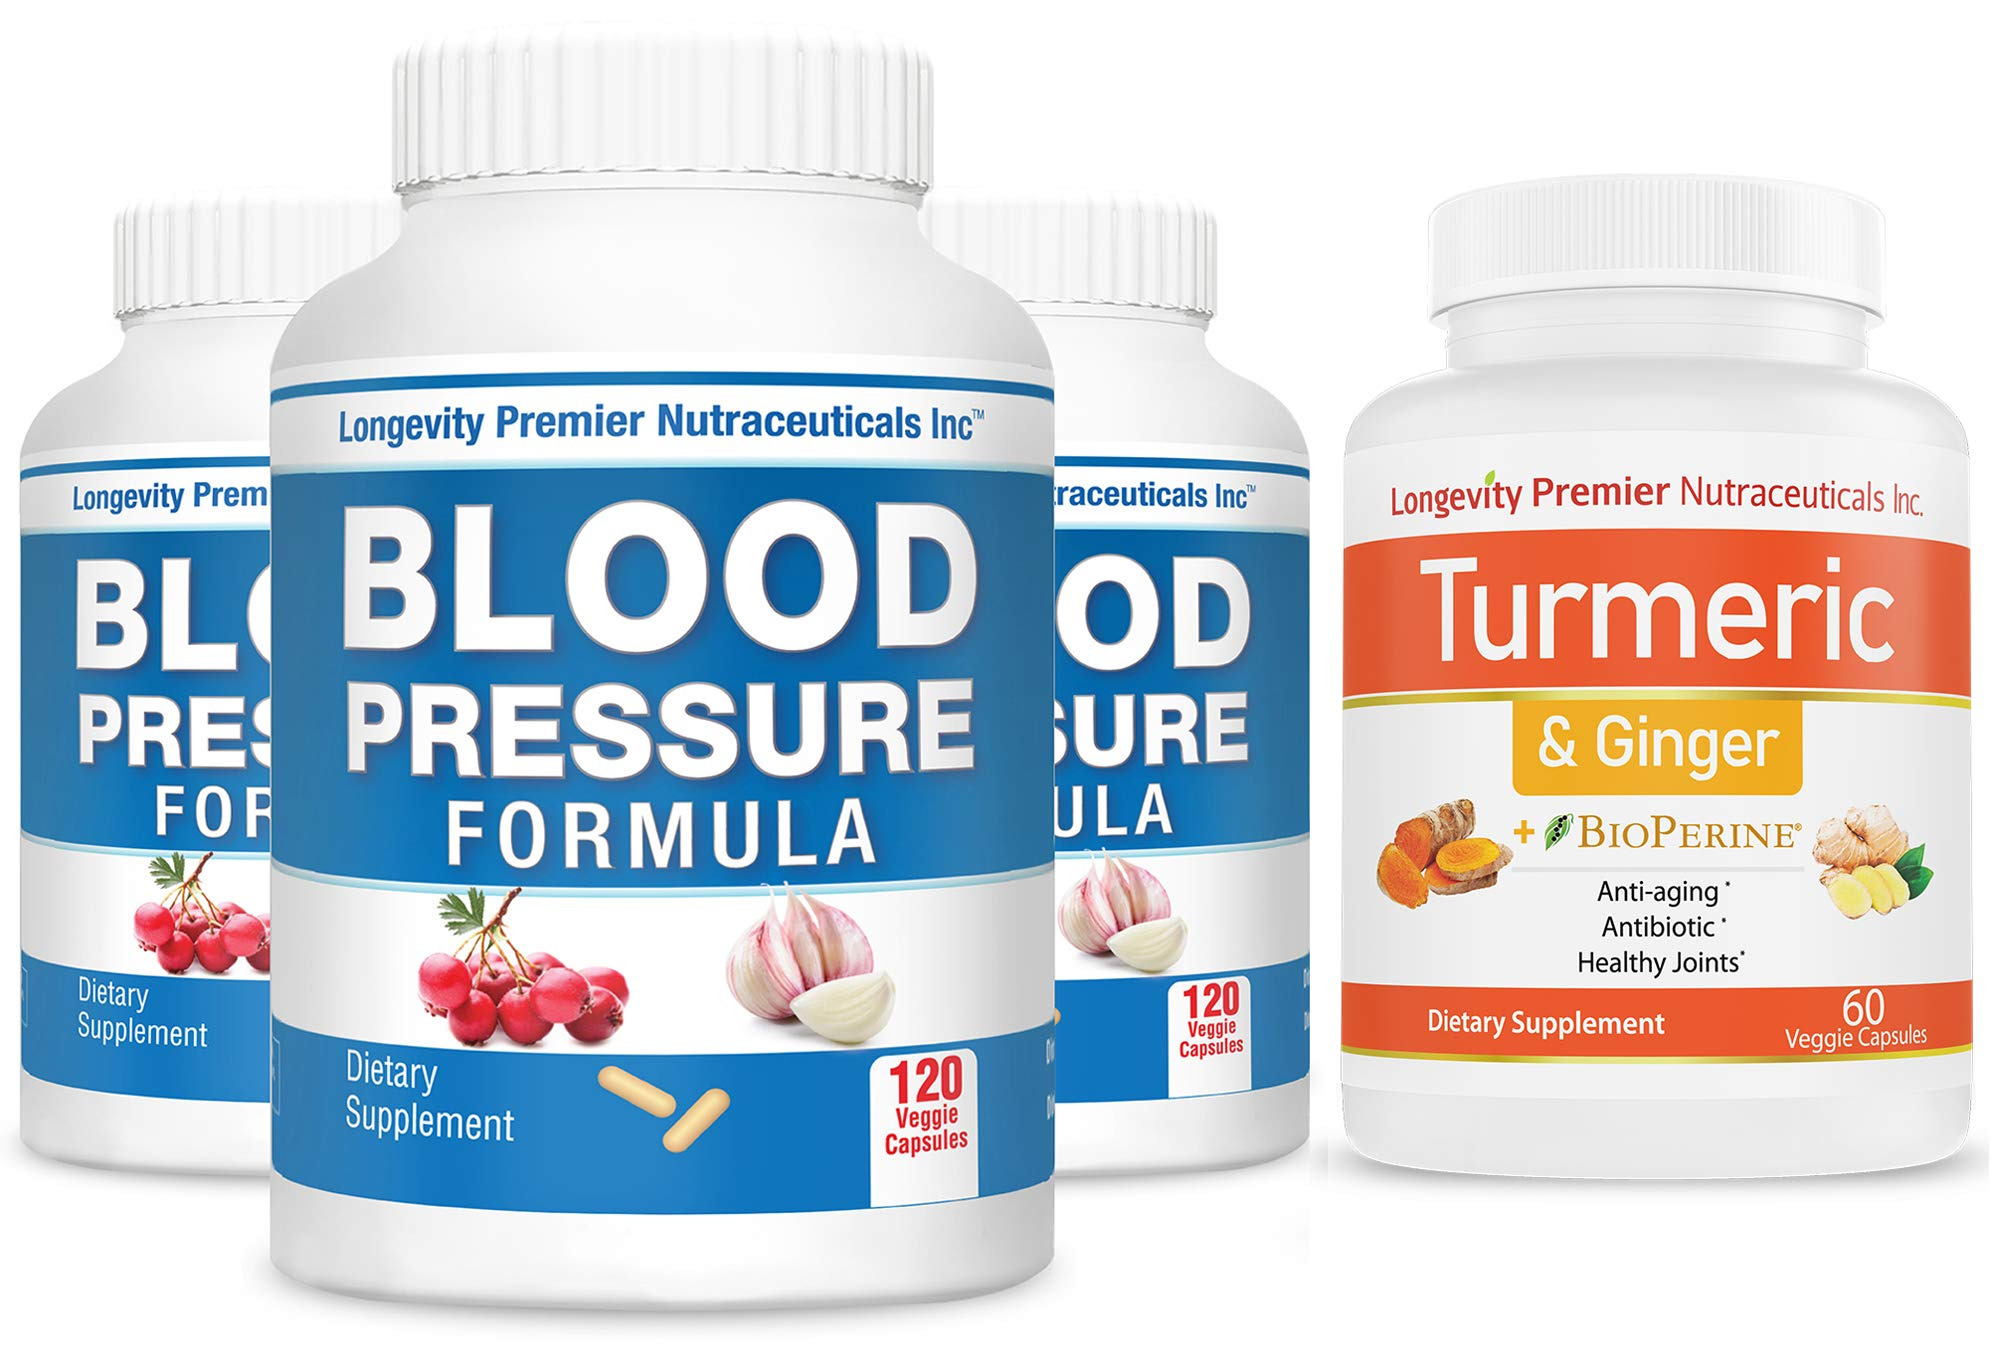 [3-Bottle Bonus Pack] Longevity Blood Pressure Formula 120 caps x 3 Bottles + 1 Free Bottle of Turmeric Curcumin with Ginger [60 Veggie Capsules]